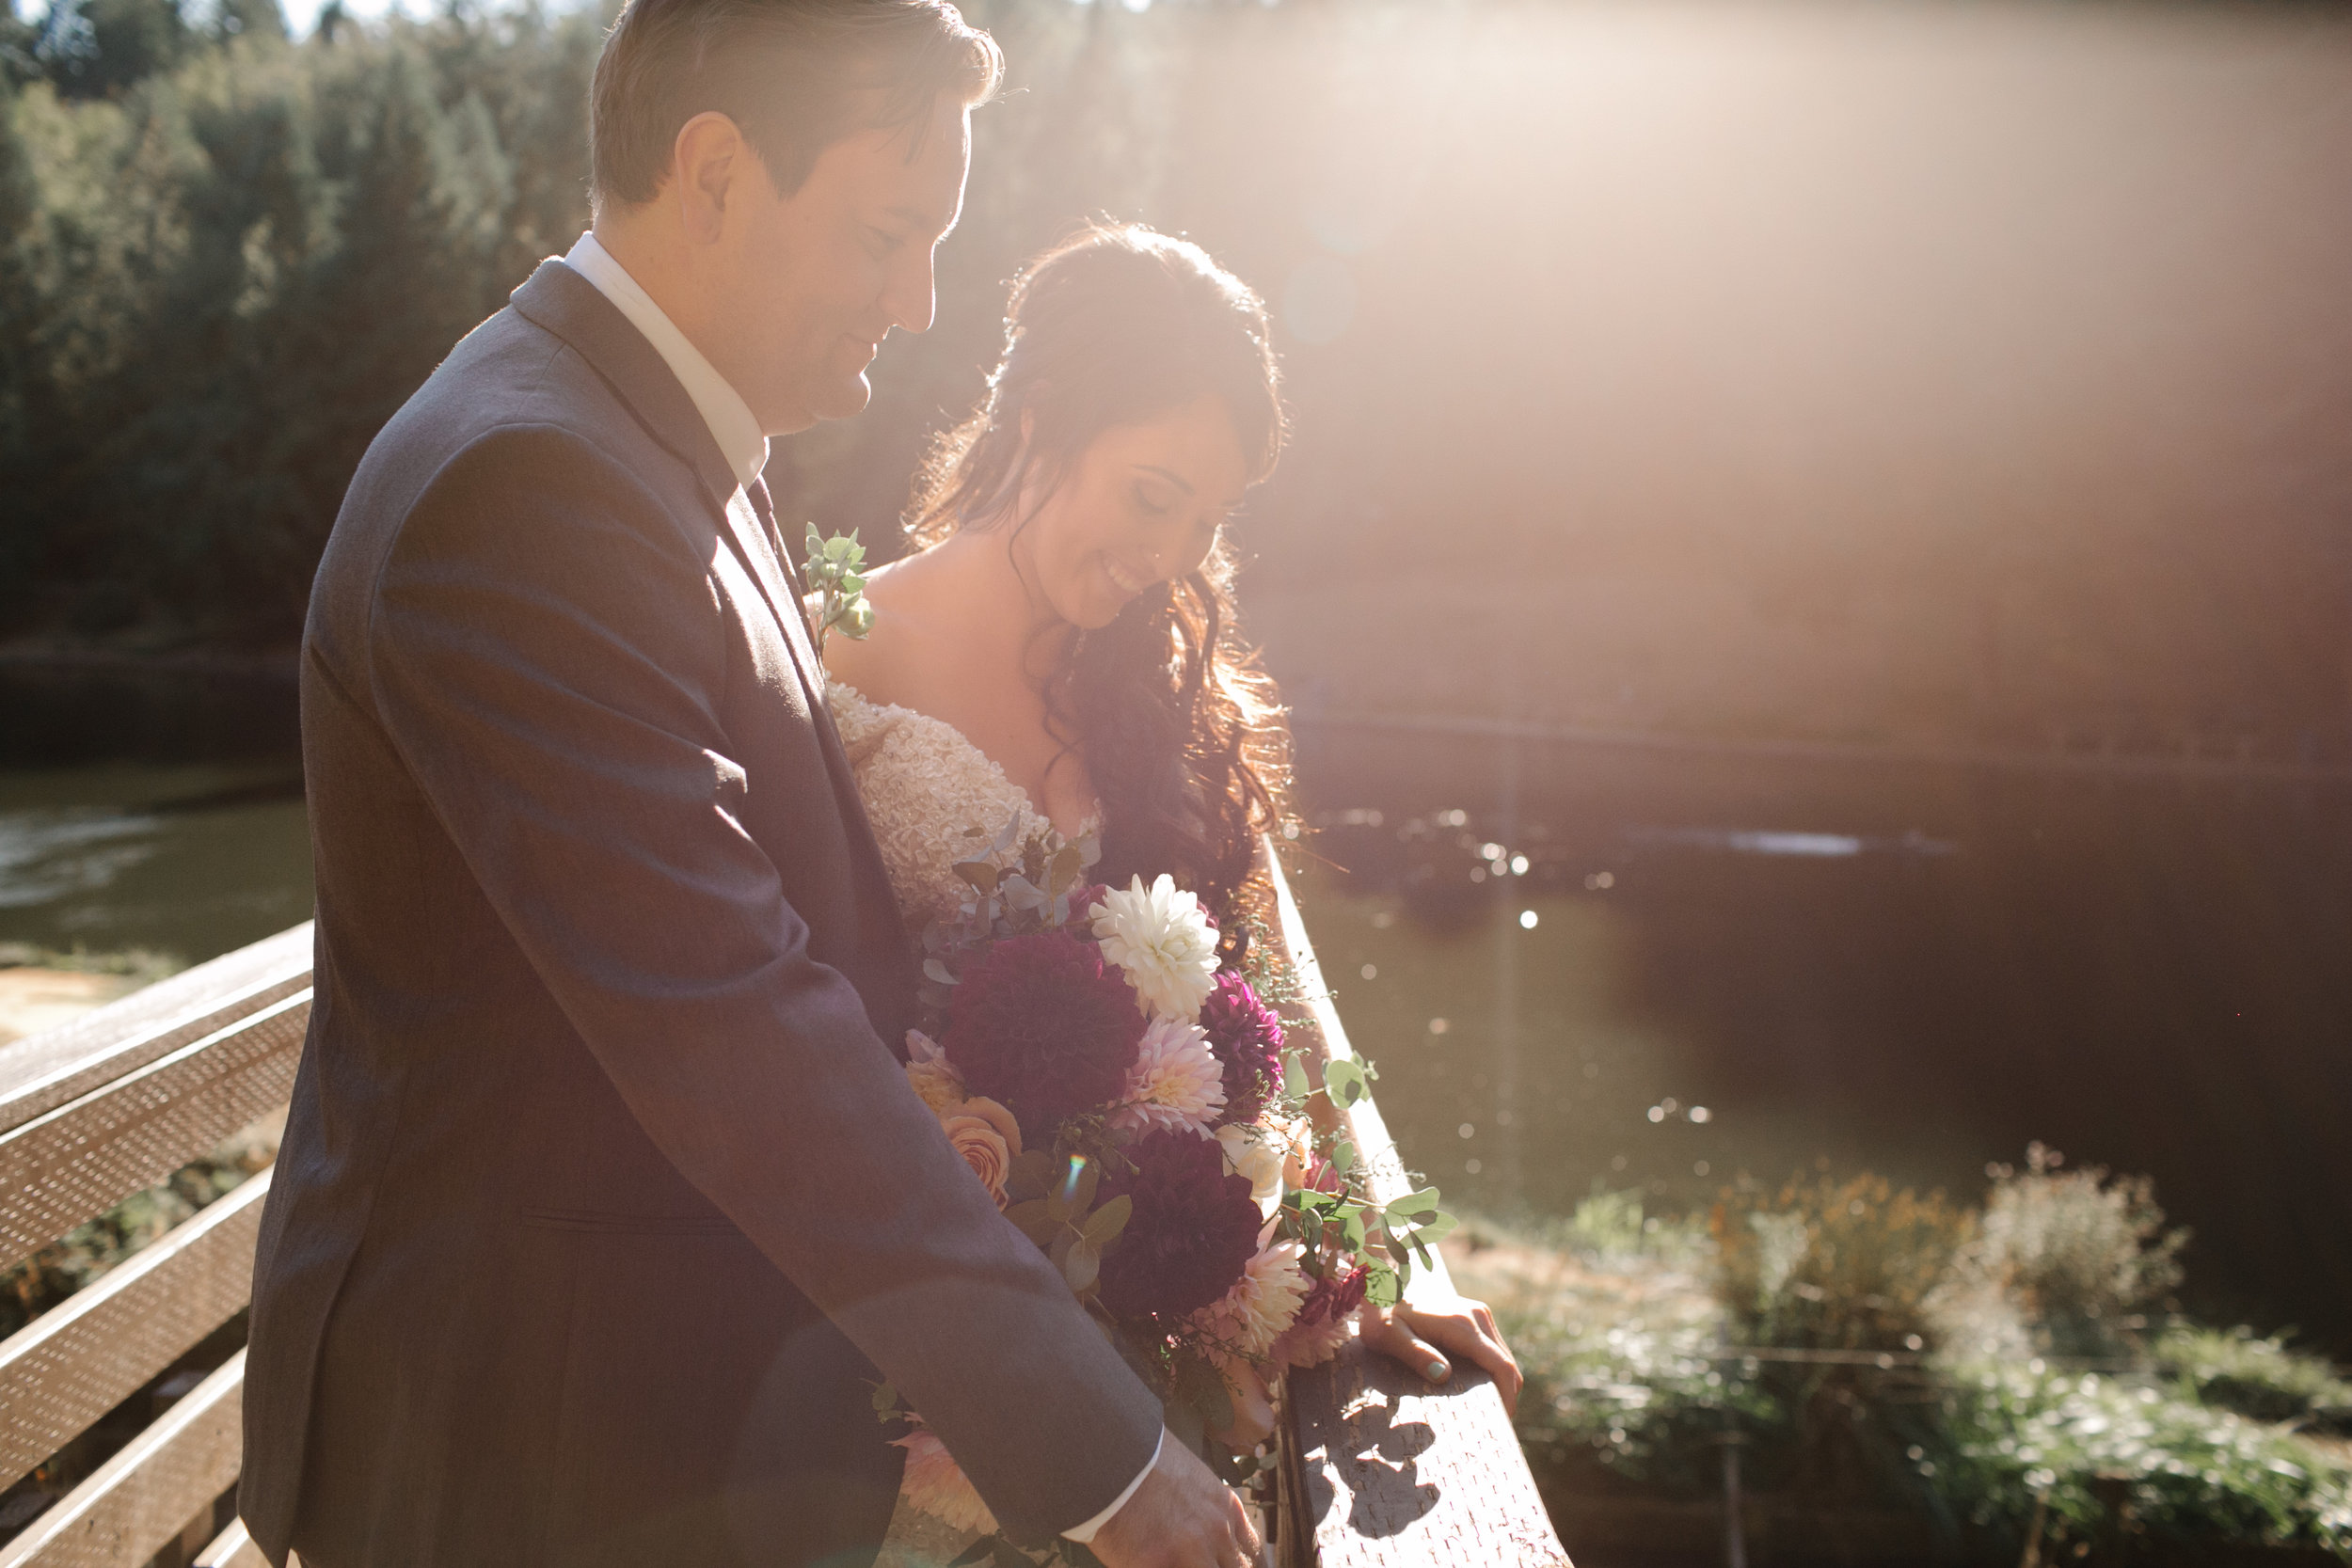 Sevlynn-Photography-Teresa-Chandler-Wedding-32.jpg